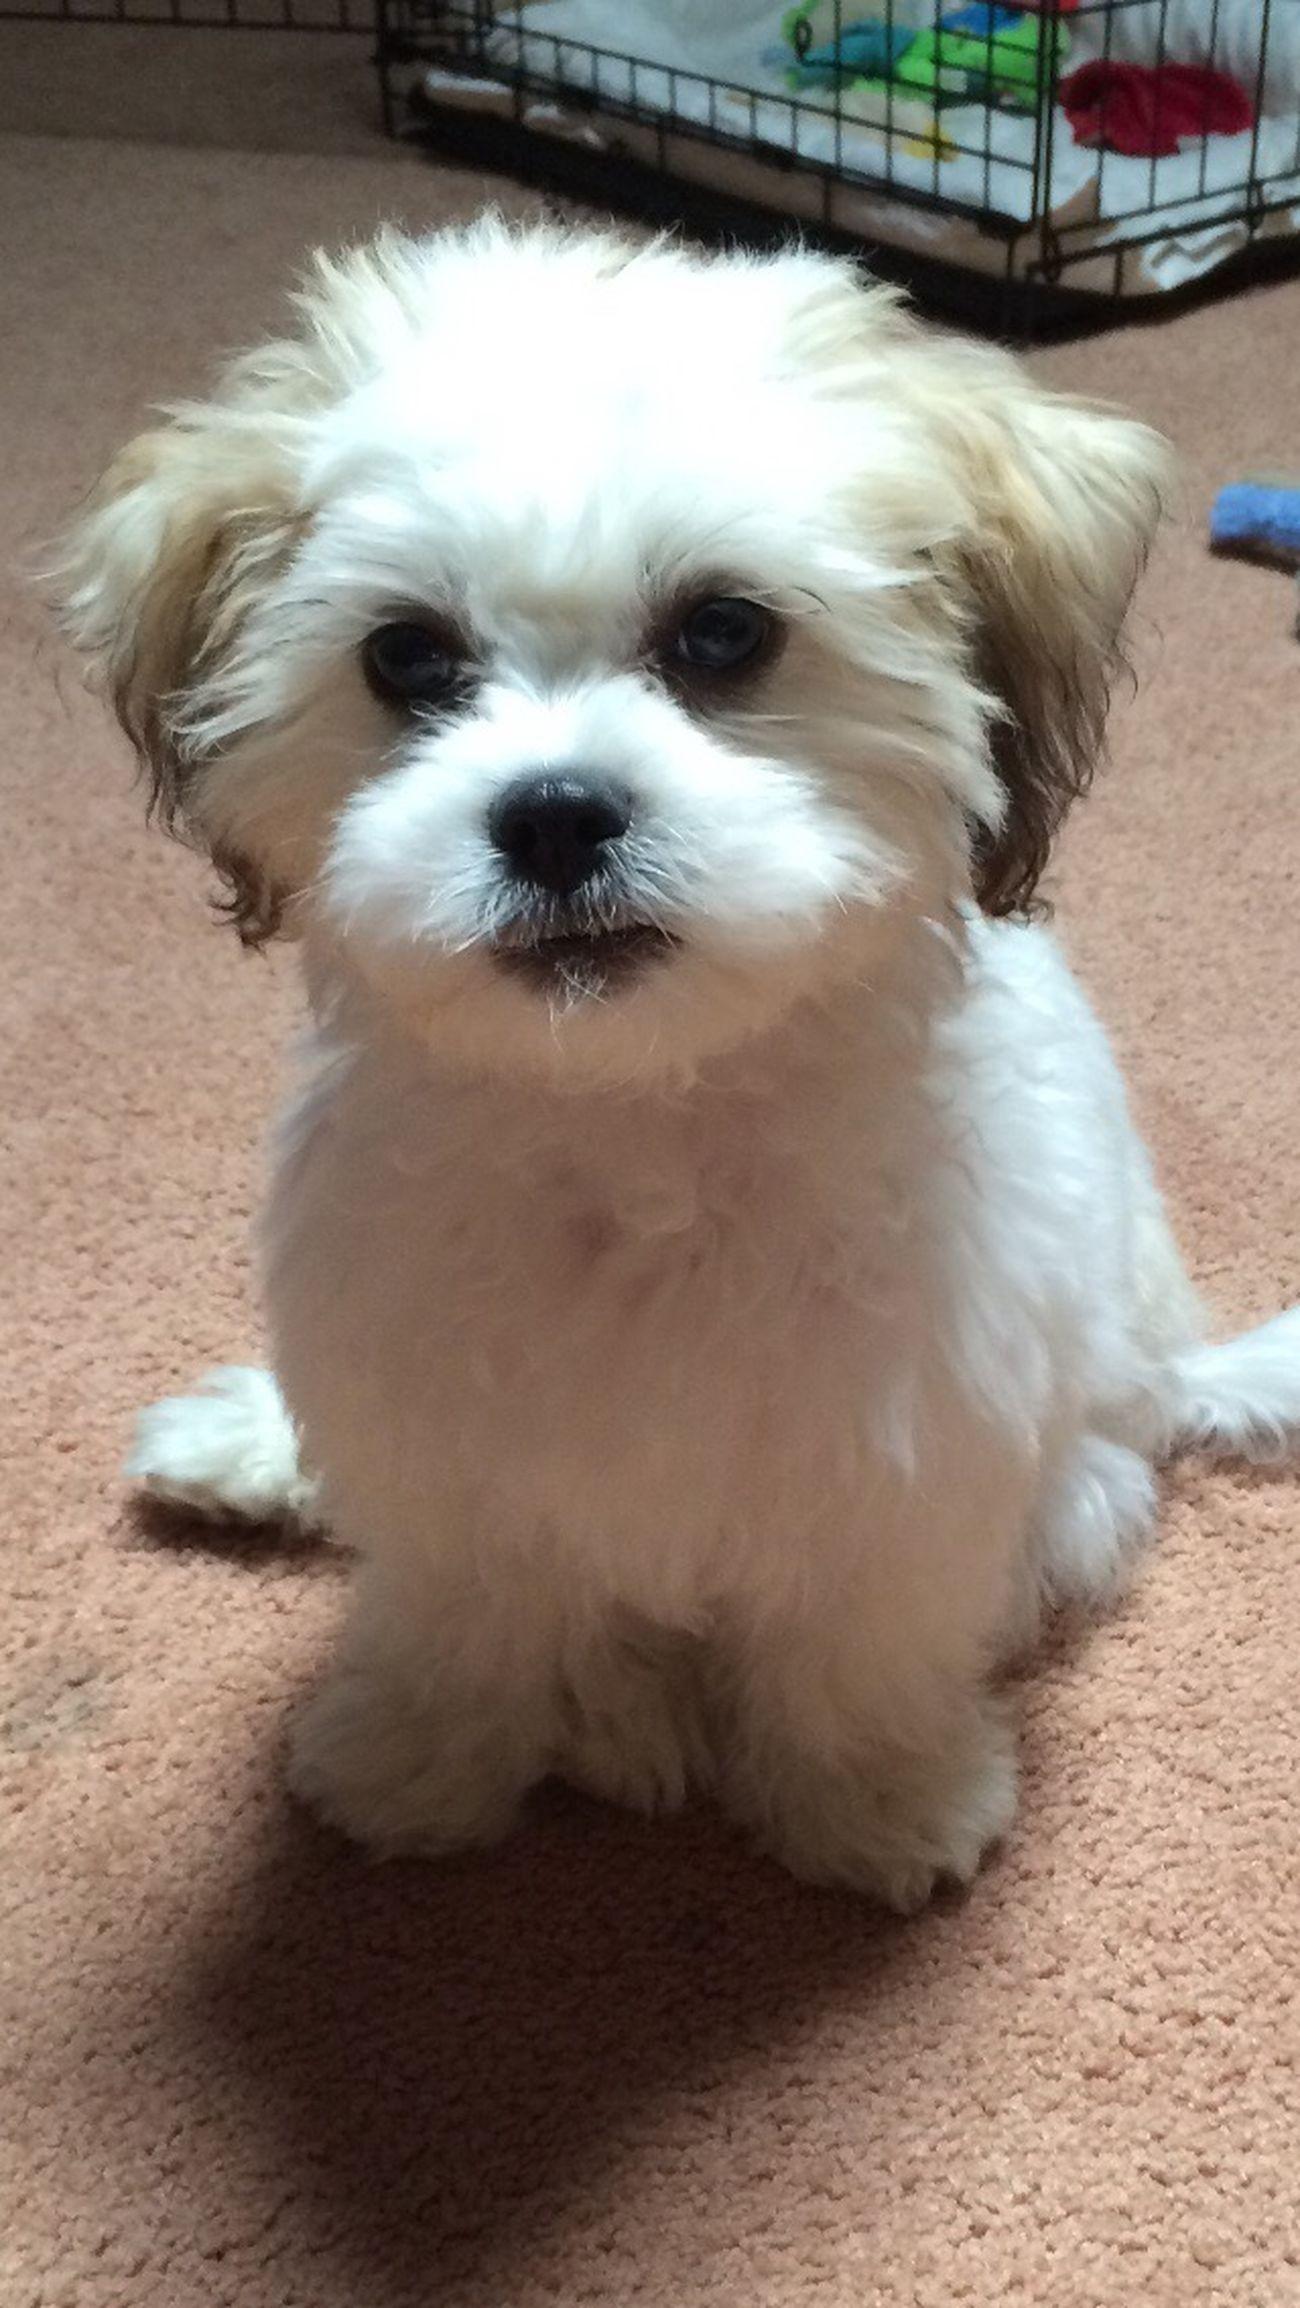 Huey Lewis as a baby Cheese! Dogs Puppy Cute Cute Pets Shitzu Bichonfrise